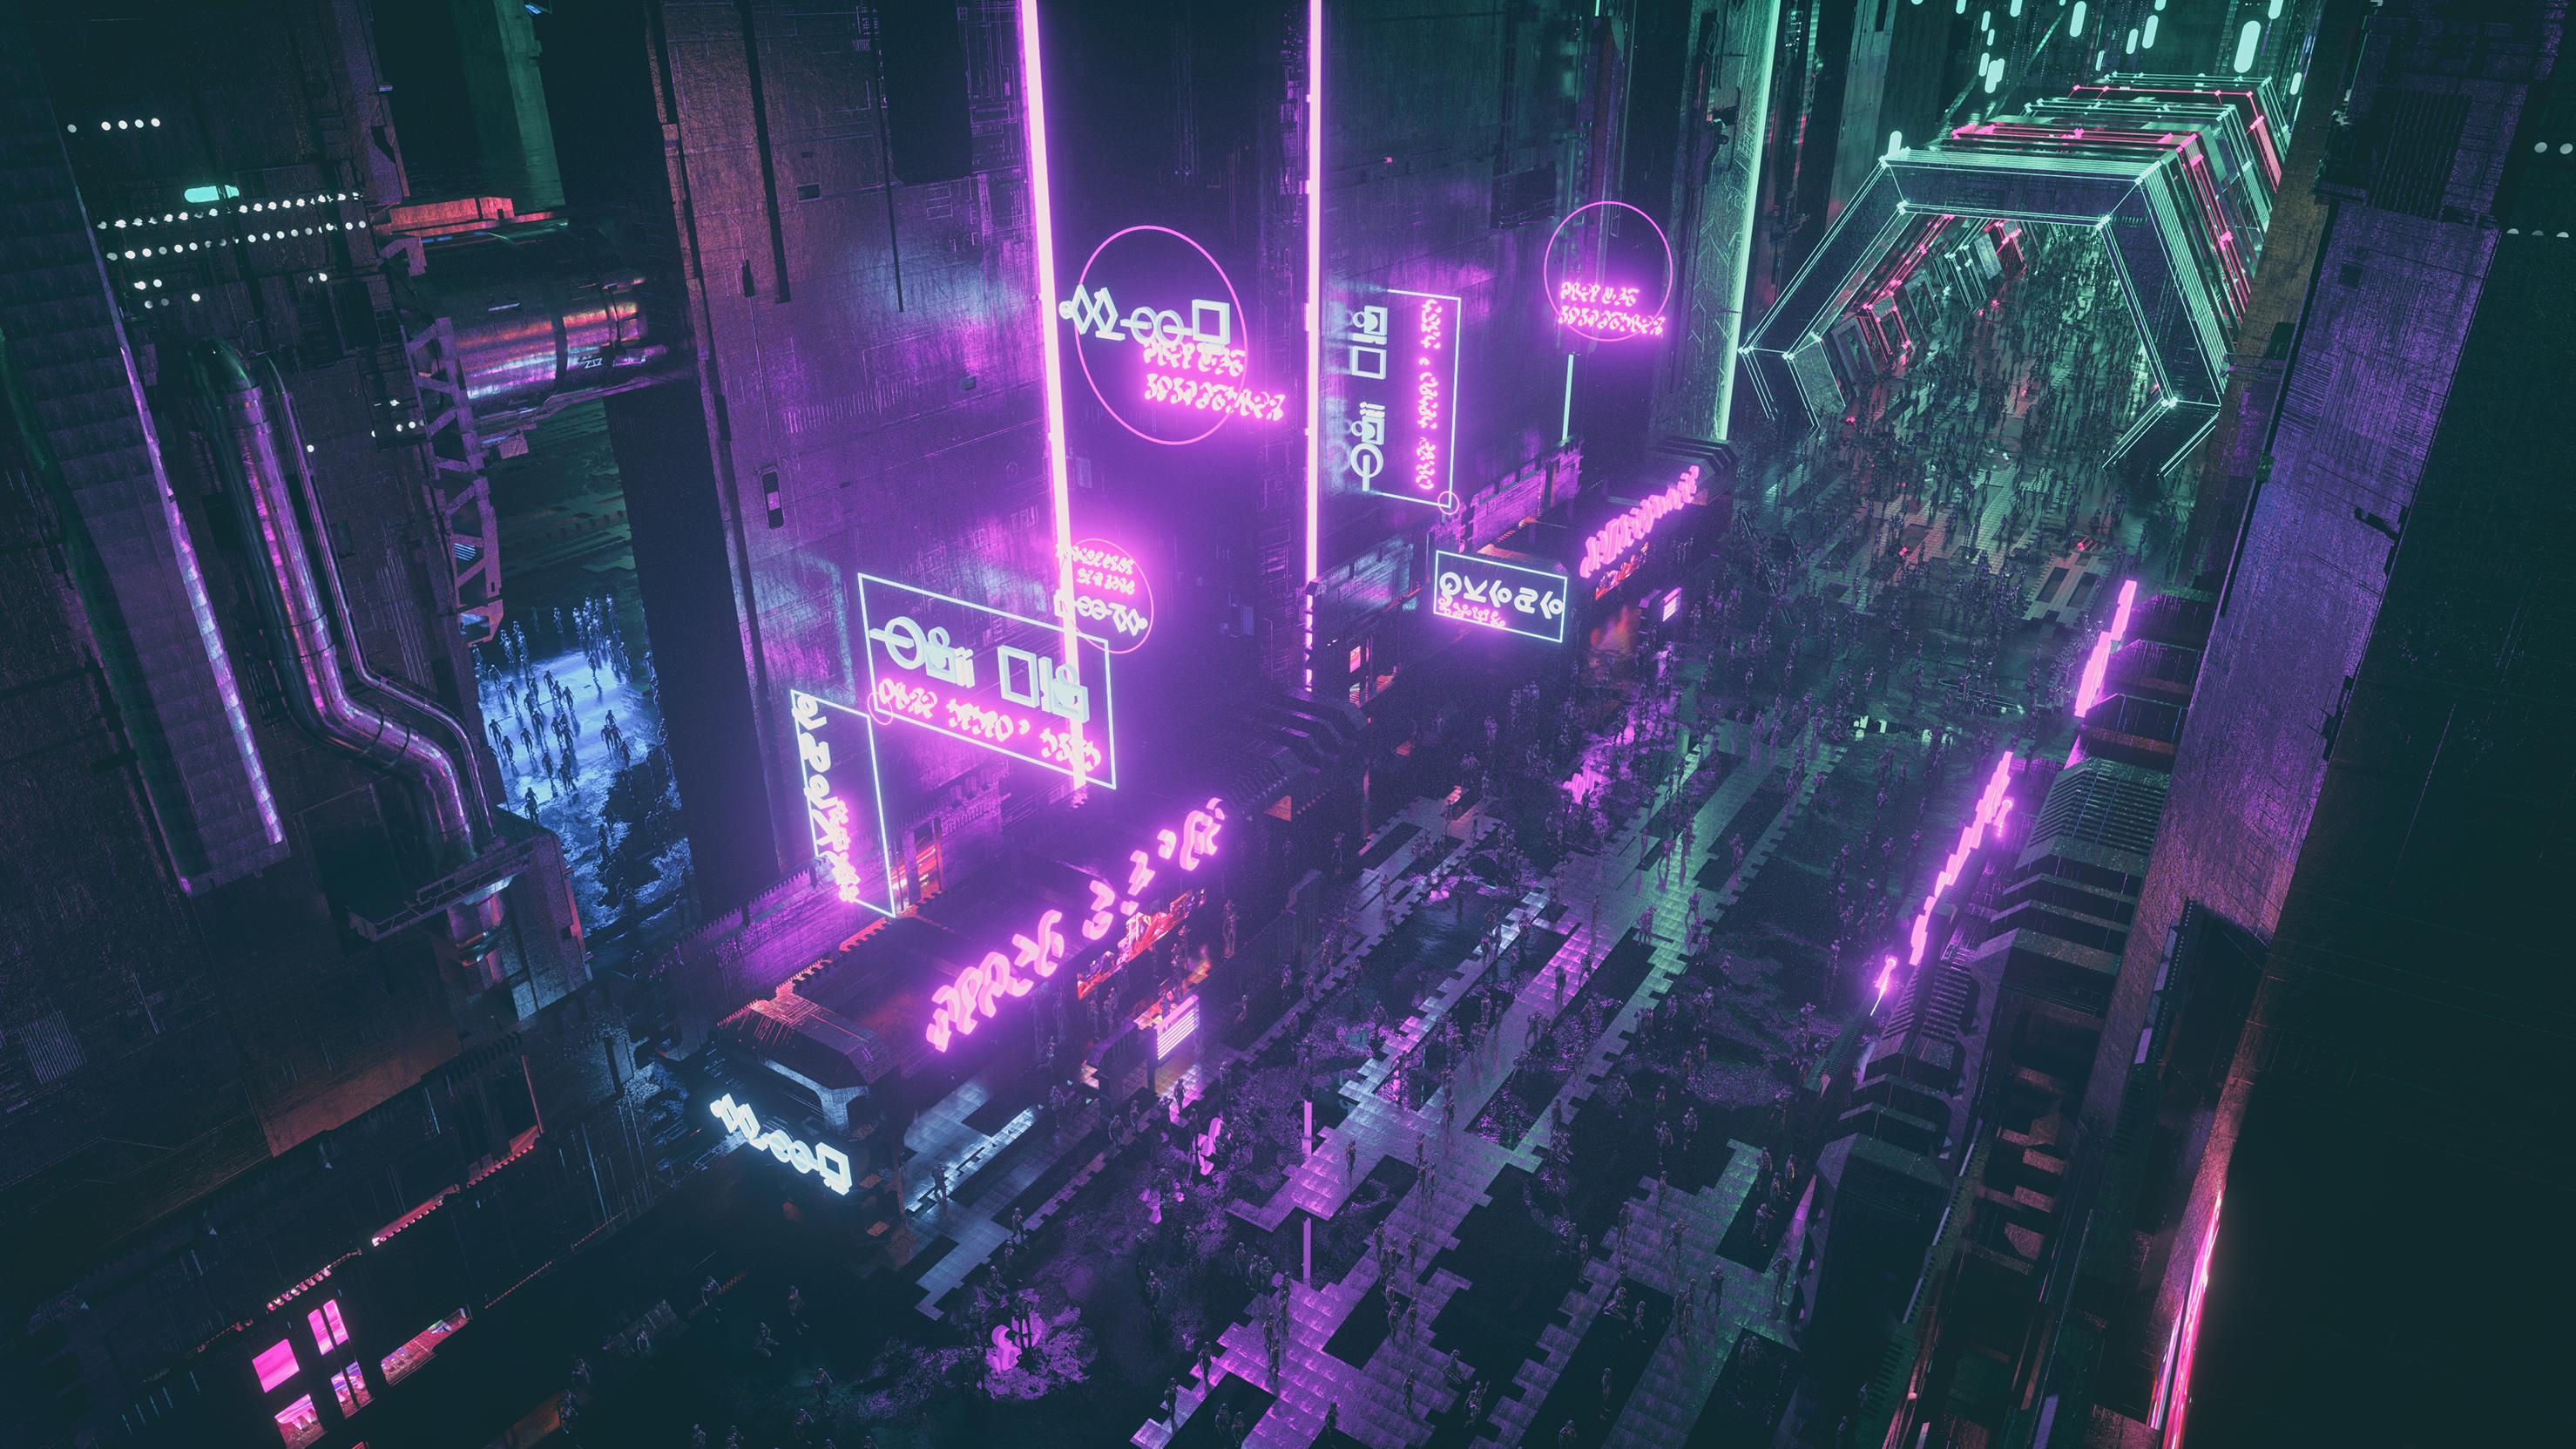 Lazerkid(WT) Concept Art #1 #cyberpunk #synthwave #futurism